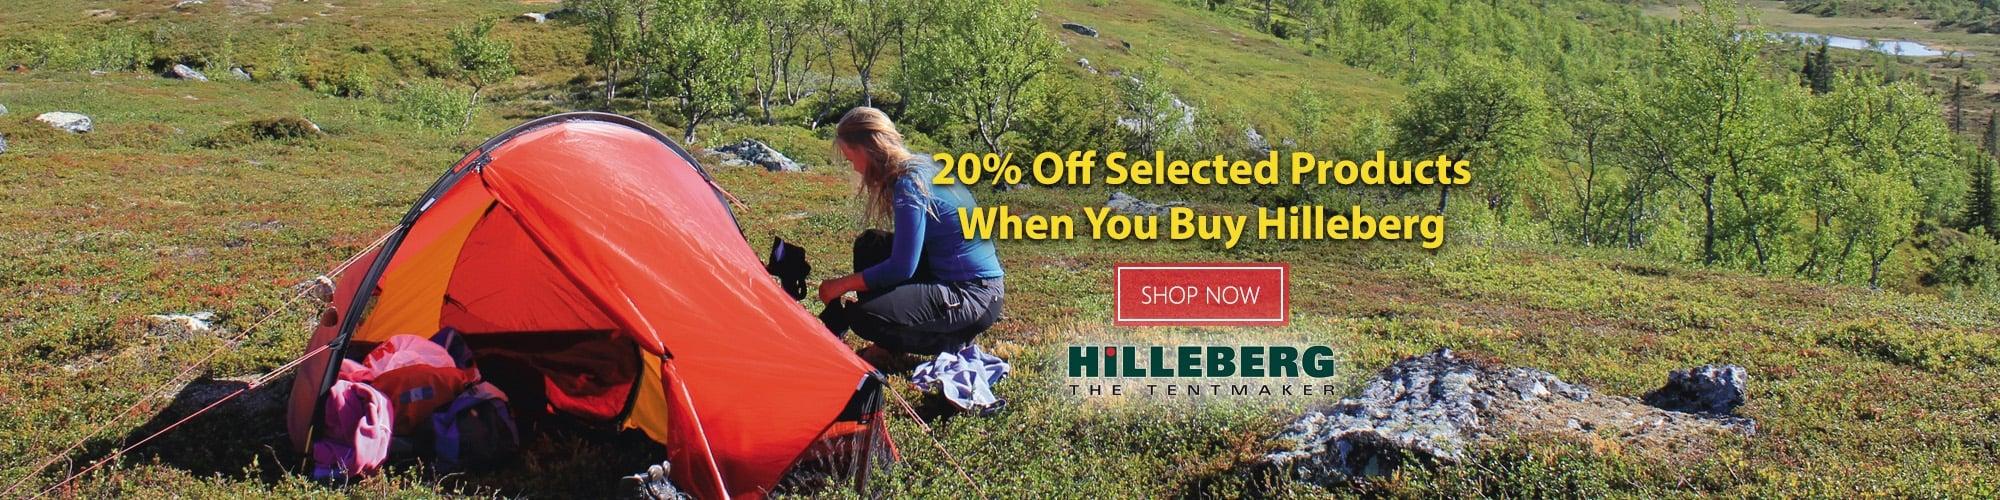 Hilleberg Tent Offer 2017